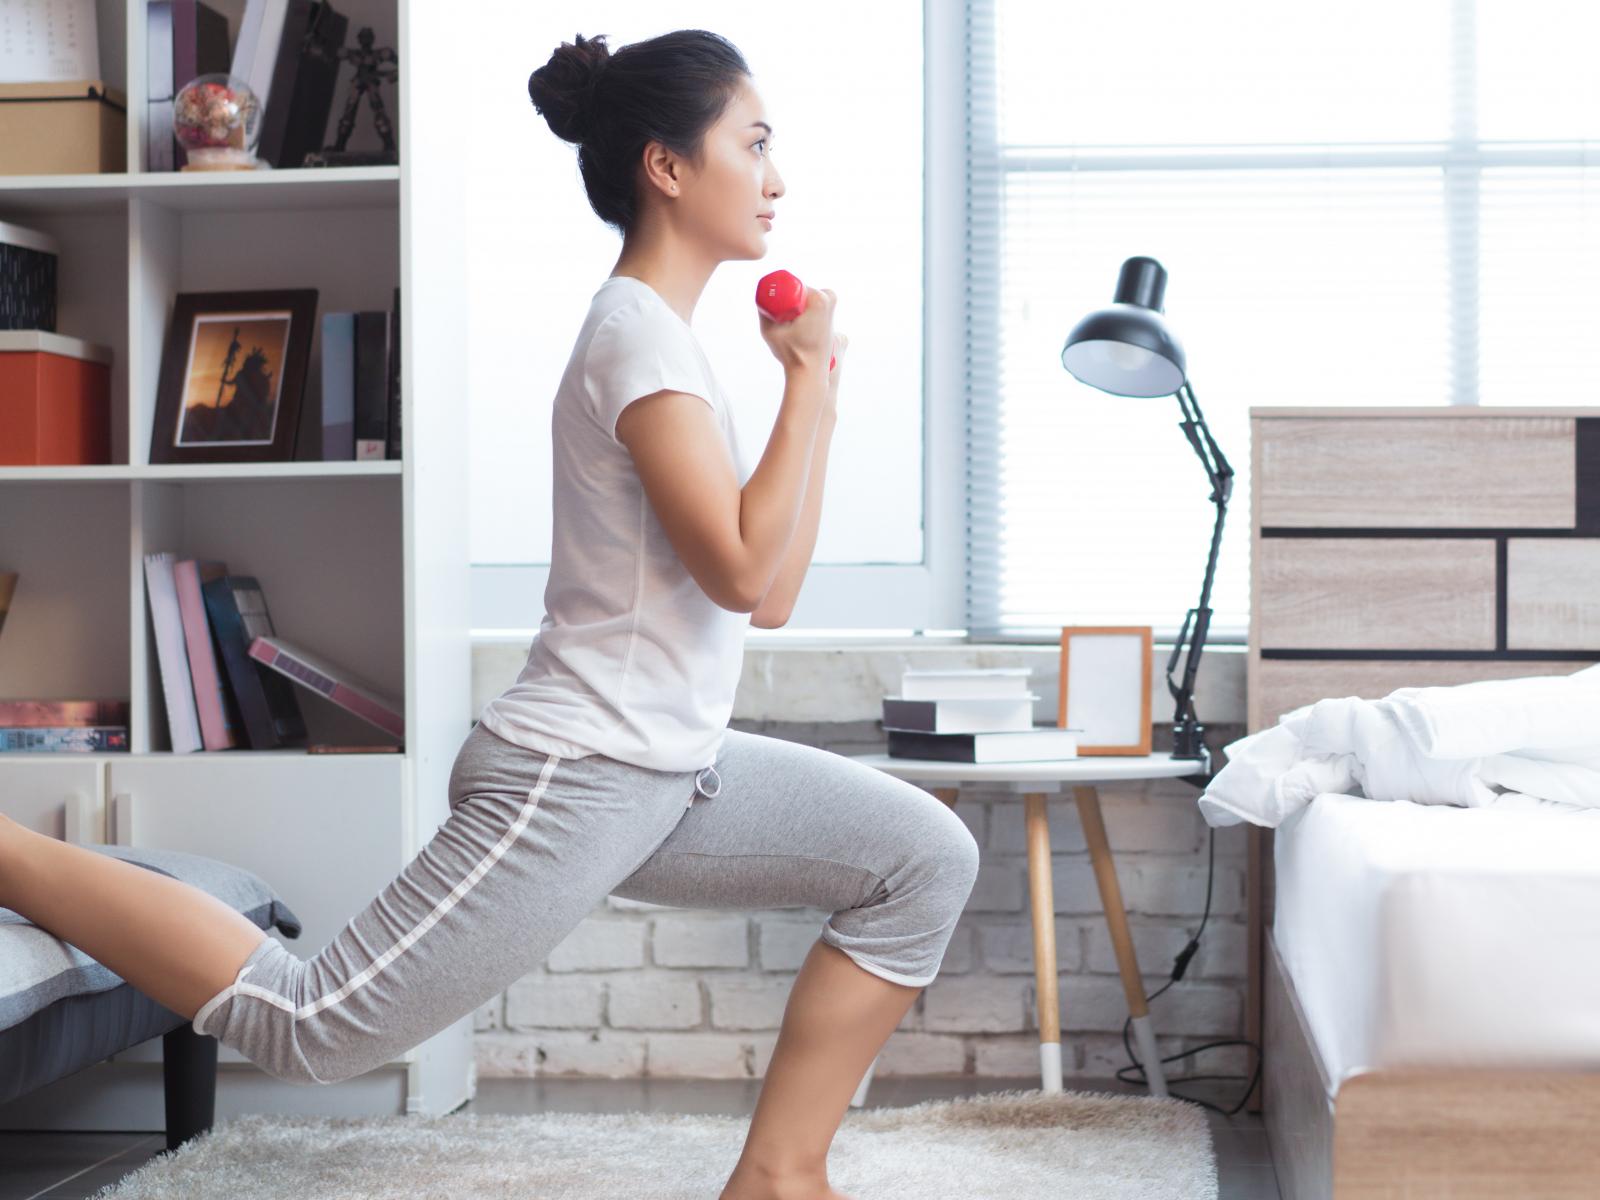 Maak ruimte voor die thuis workout!